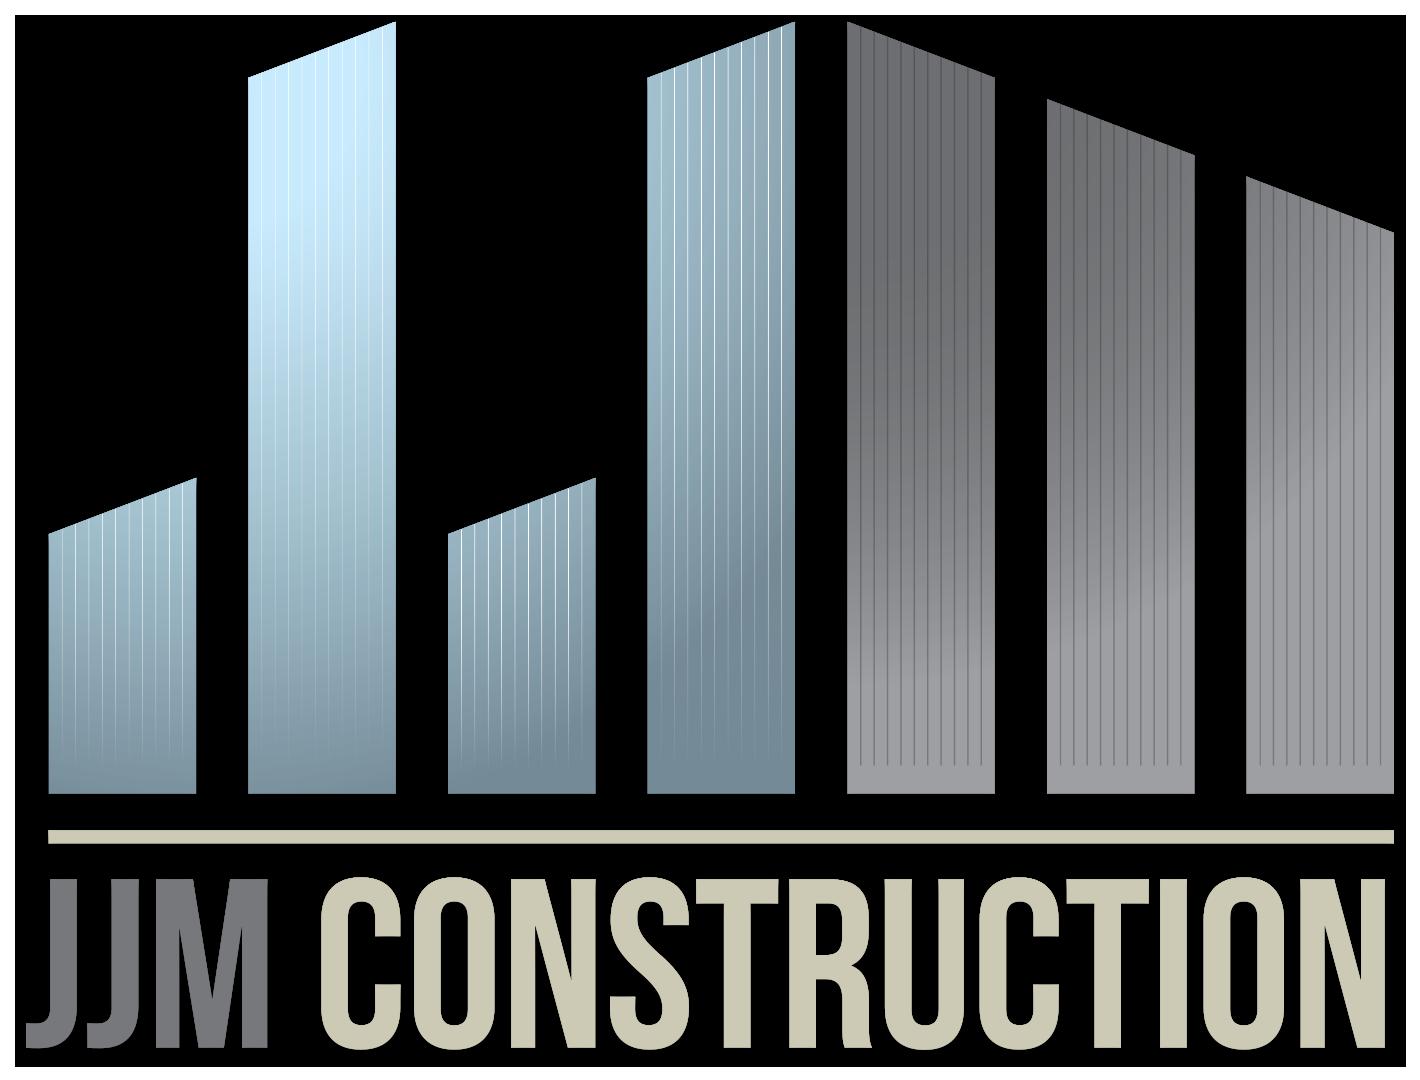 JJM Construction